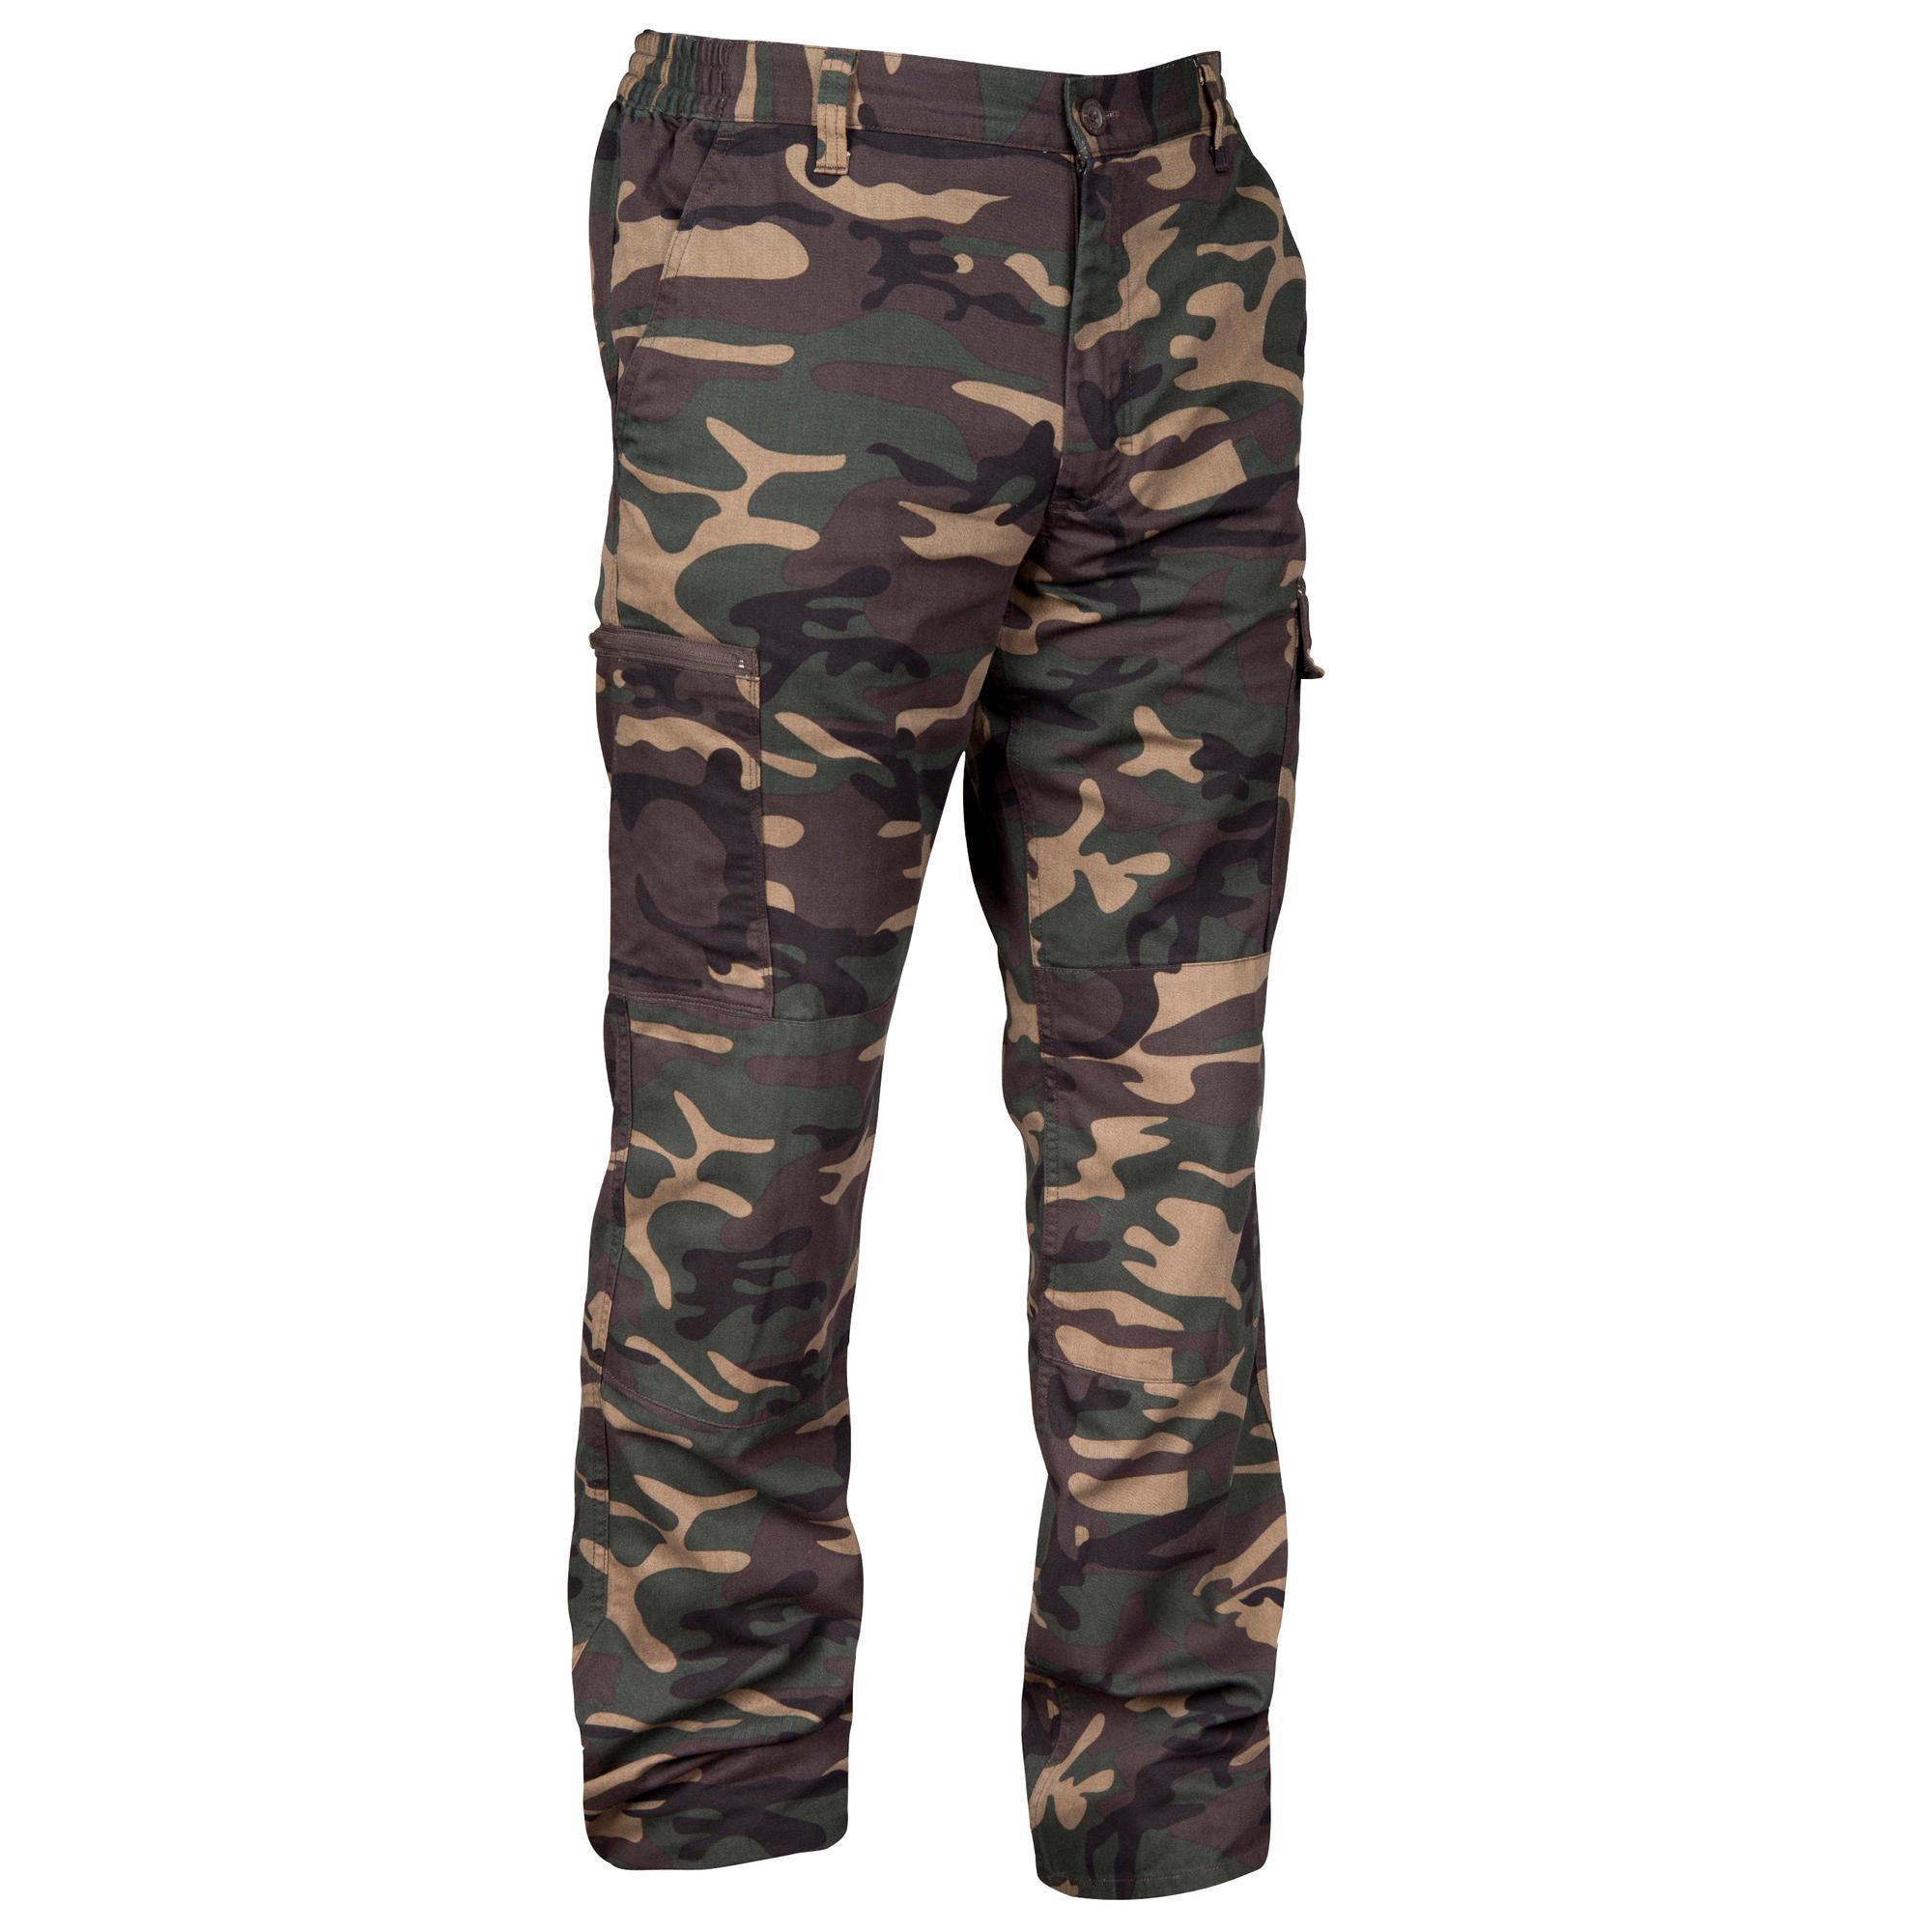 Jagdhose Steppe 300 woodland grün camouflage   Sportbekleidung > Sporthosen > Trekkinghosen   Solognac